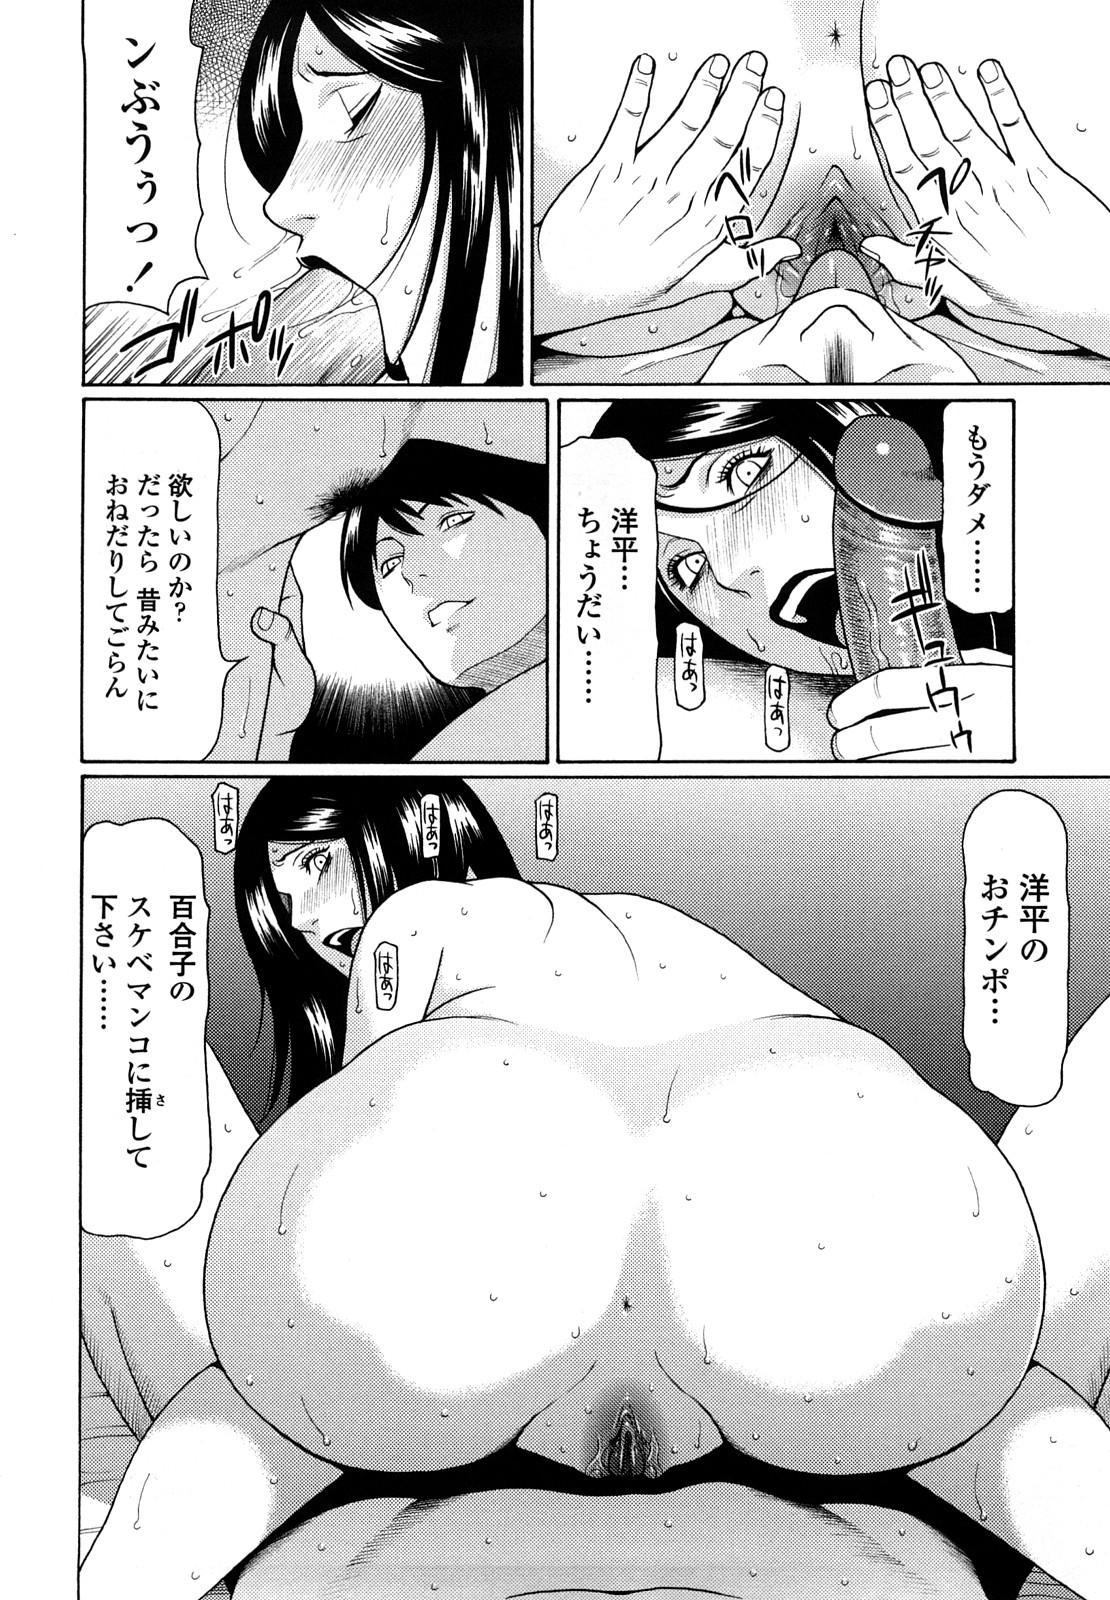 [Takasugi Kou] Kindan no Haha-Ana - Immorality Love-Hole [Decensored] 203